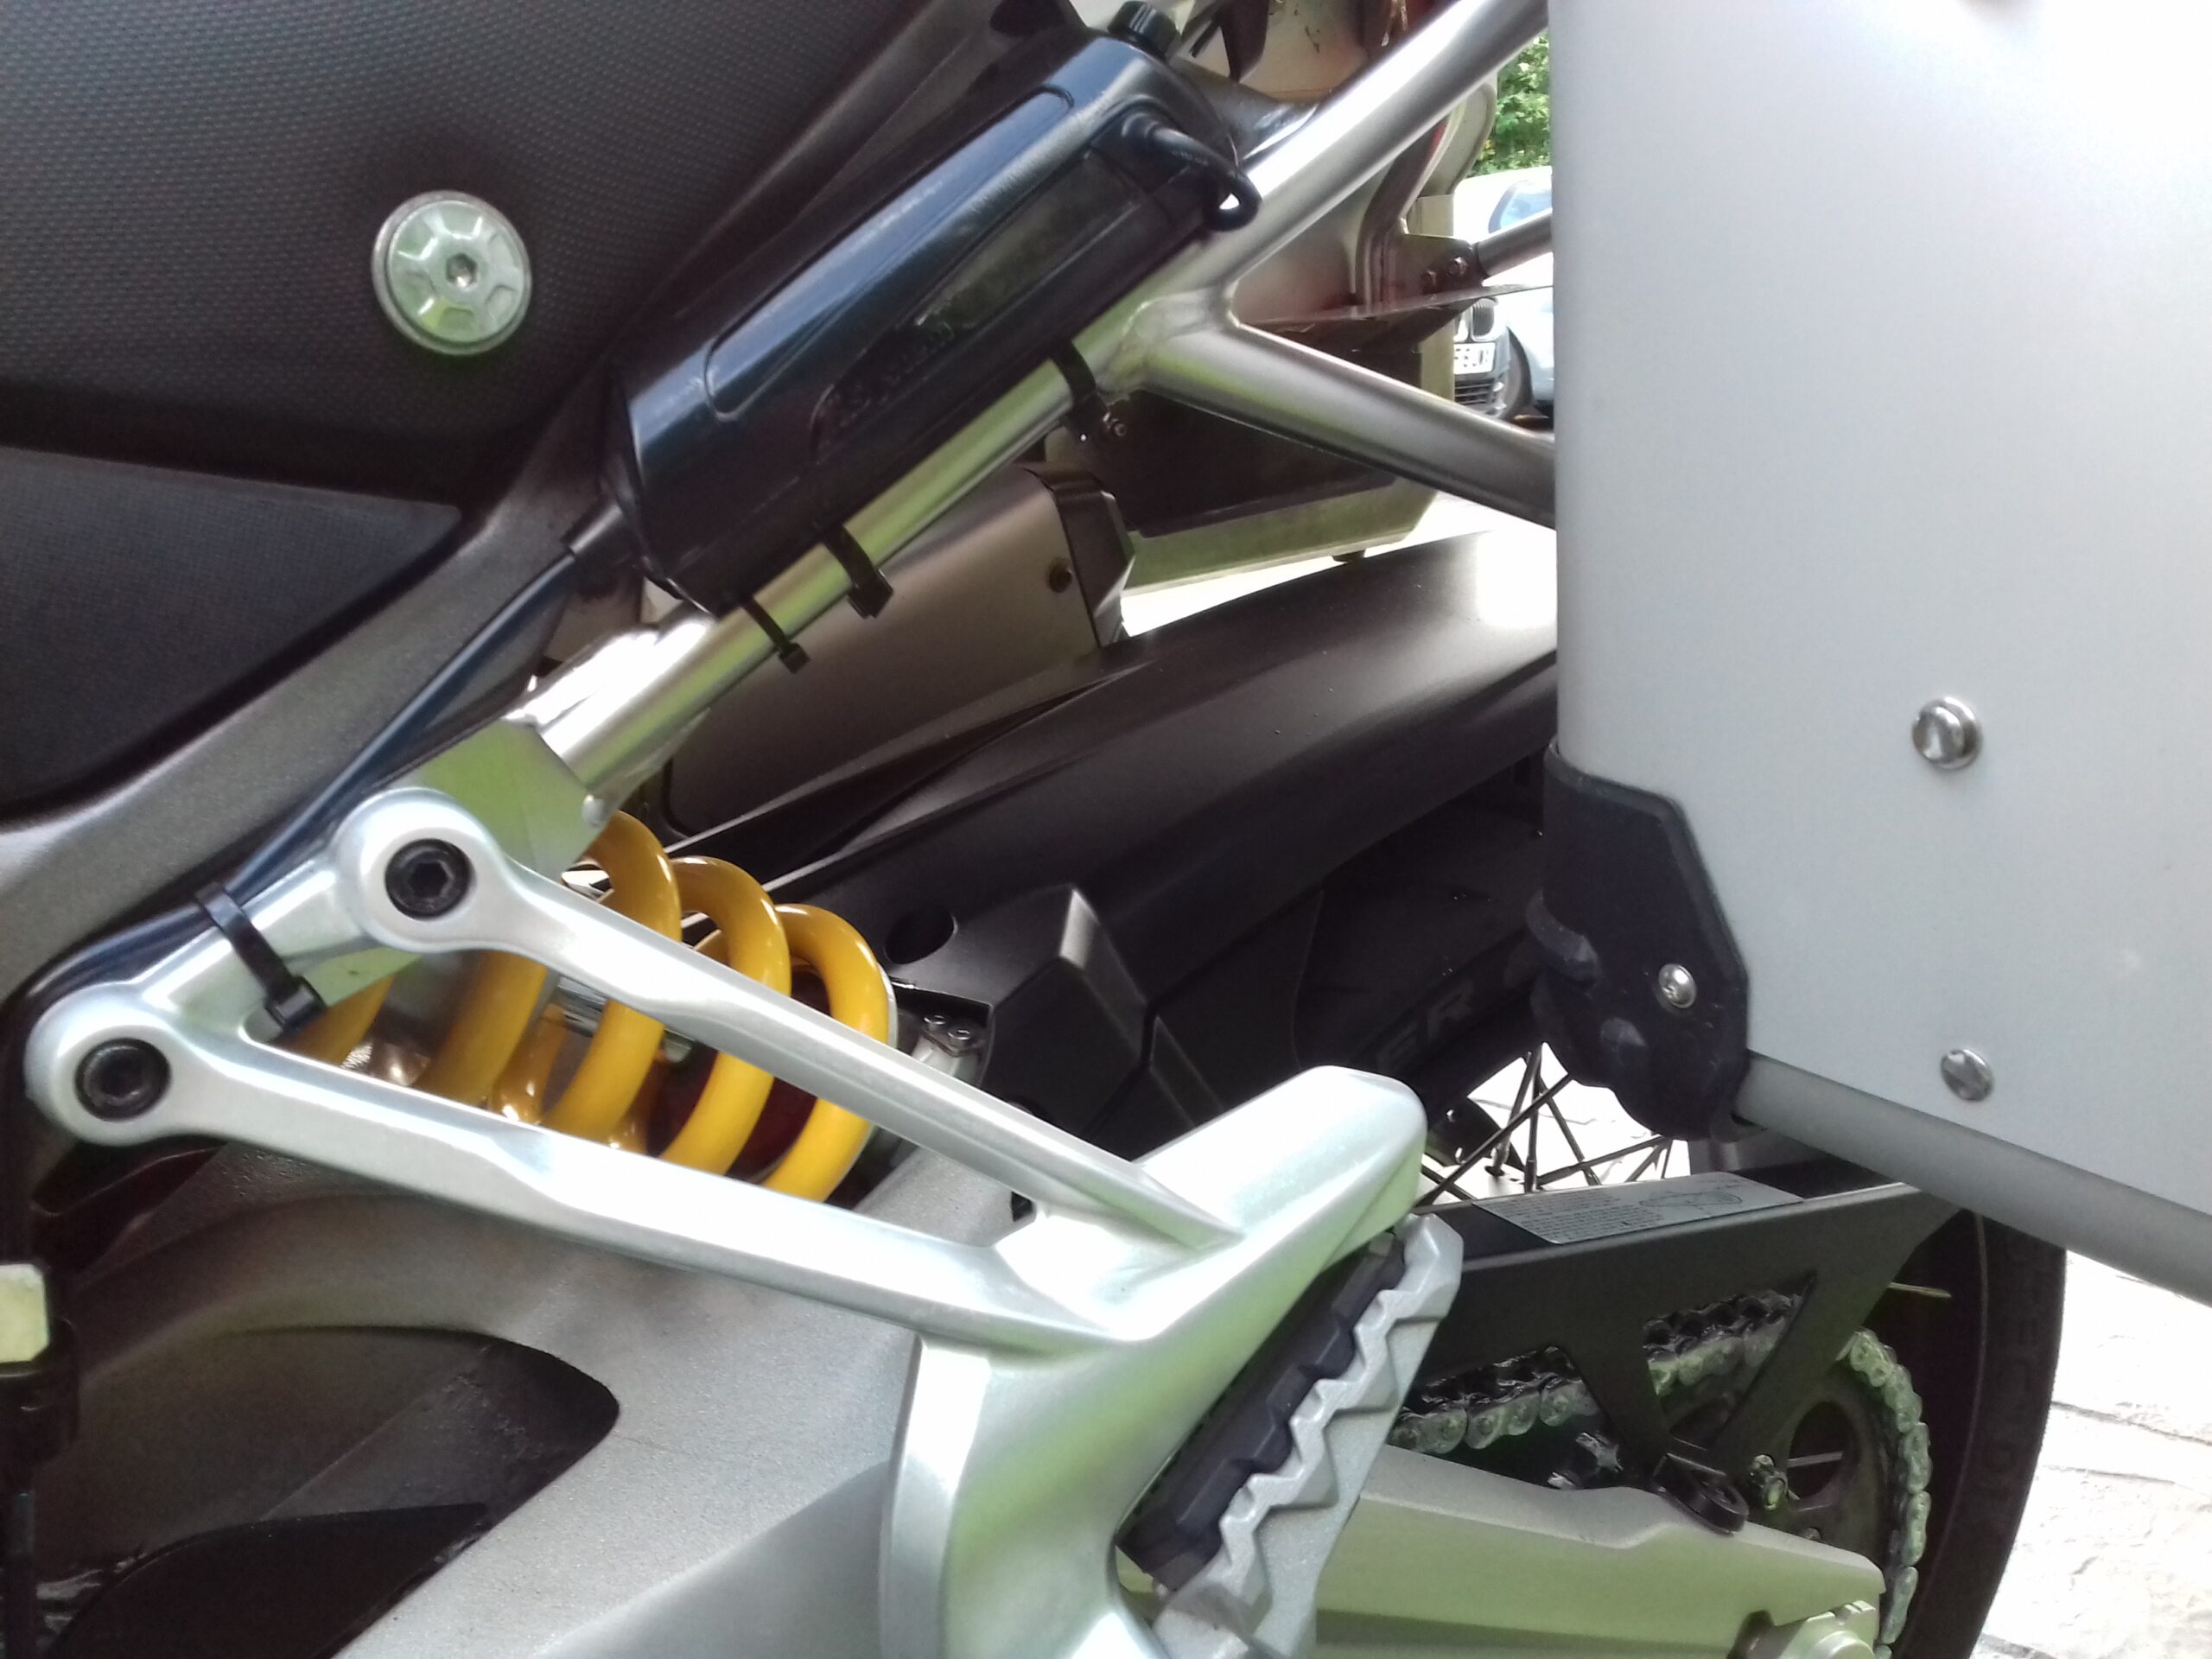 DUCATI MULTISTRADA 1200 ENDURO FULL TOURING PACK MASSIVE SPECIFICATION TERMIGNONI EXHAUST.